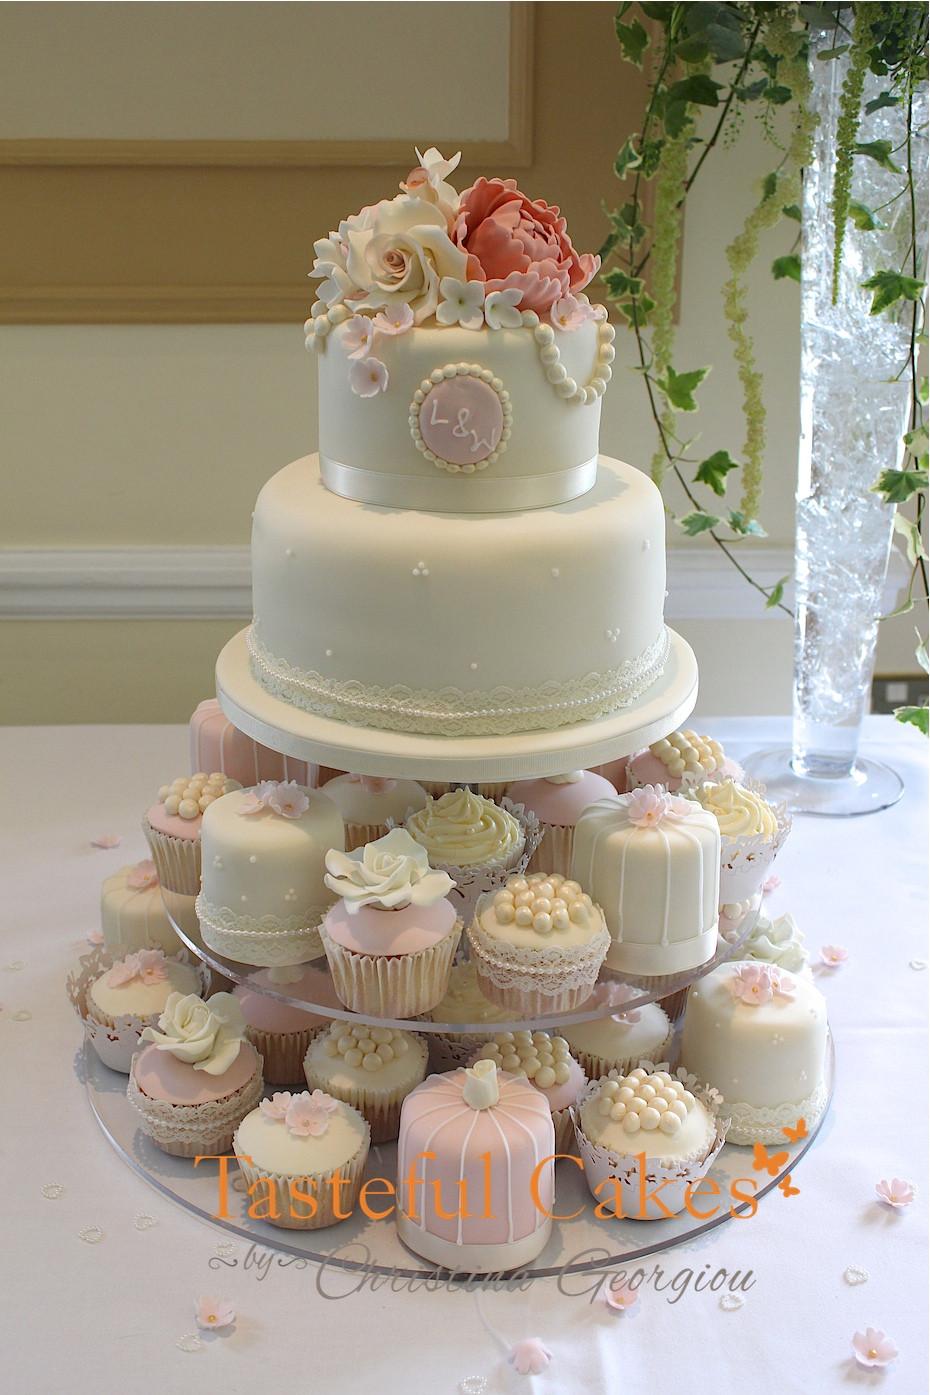 Small Wedding Cakes With Cupcakes  Tasteful Cakes By Christina Georgiou